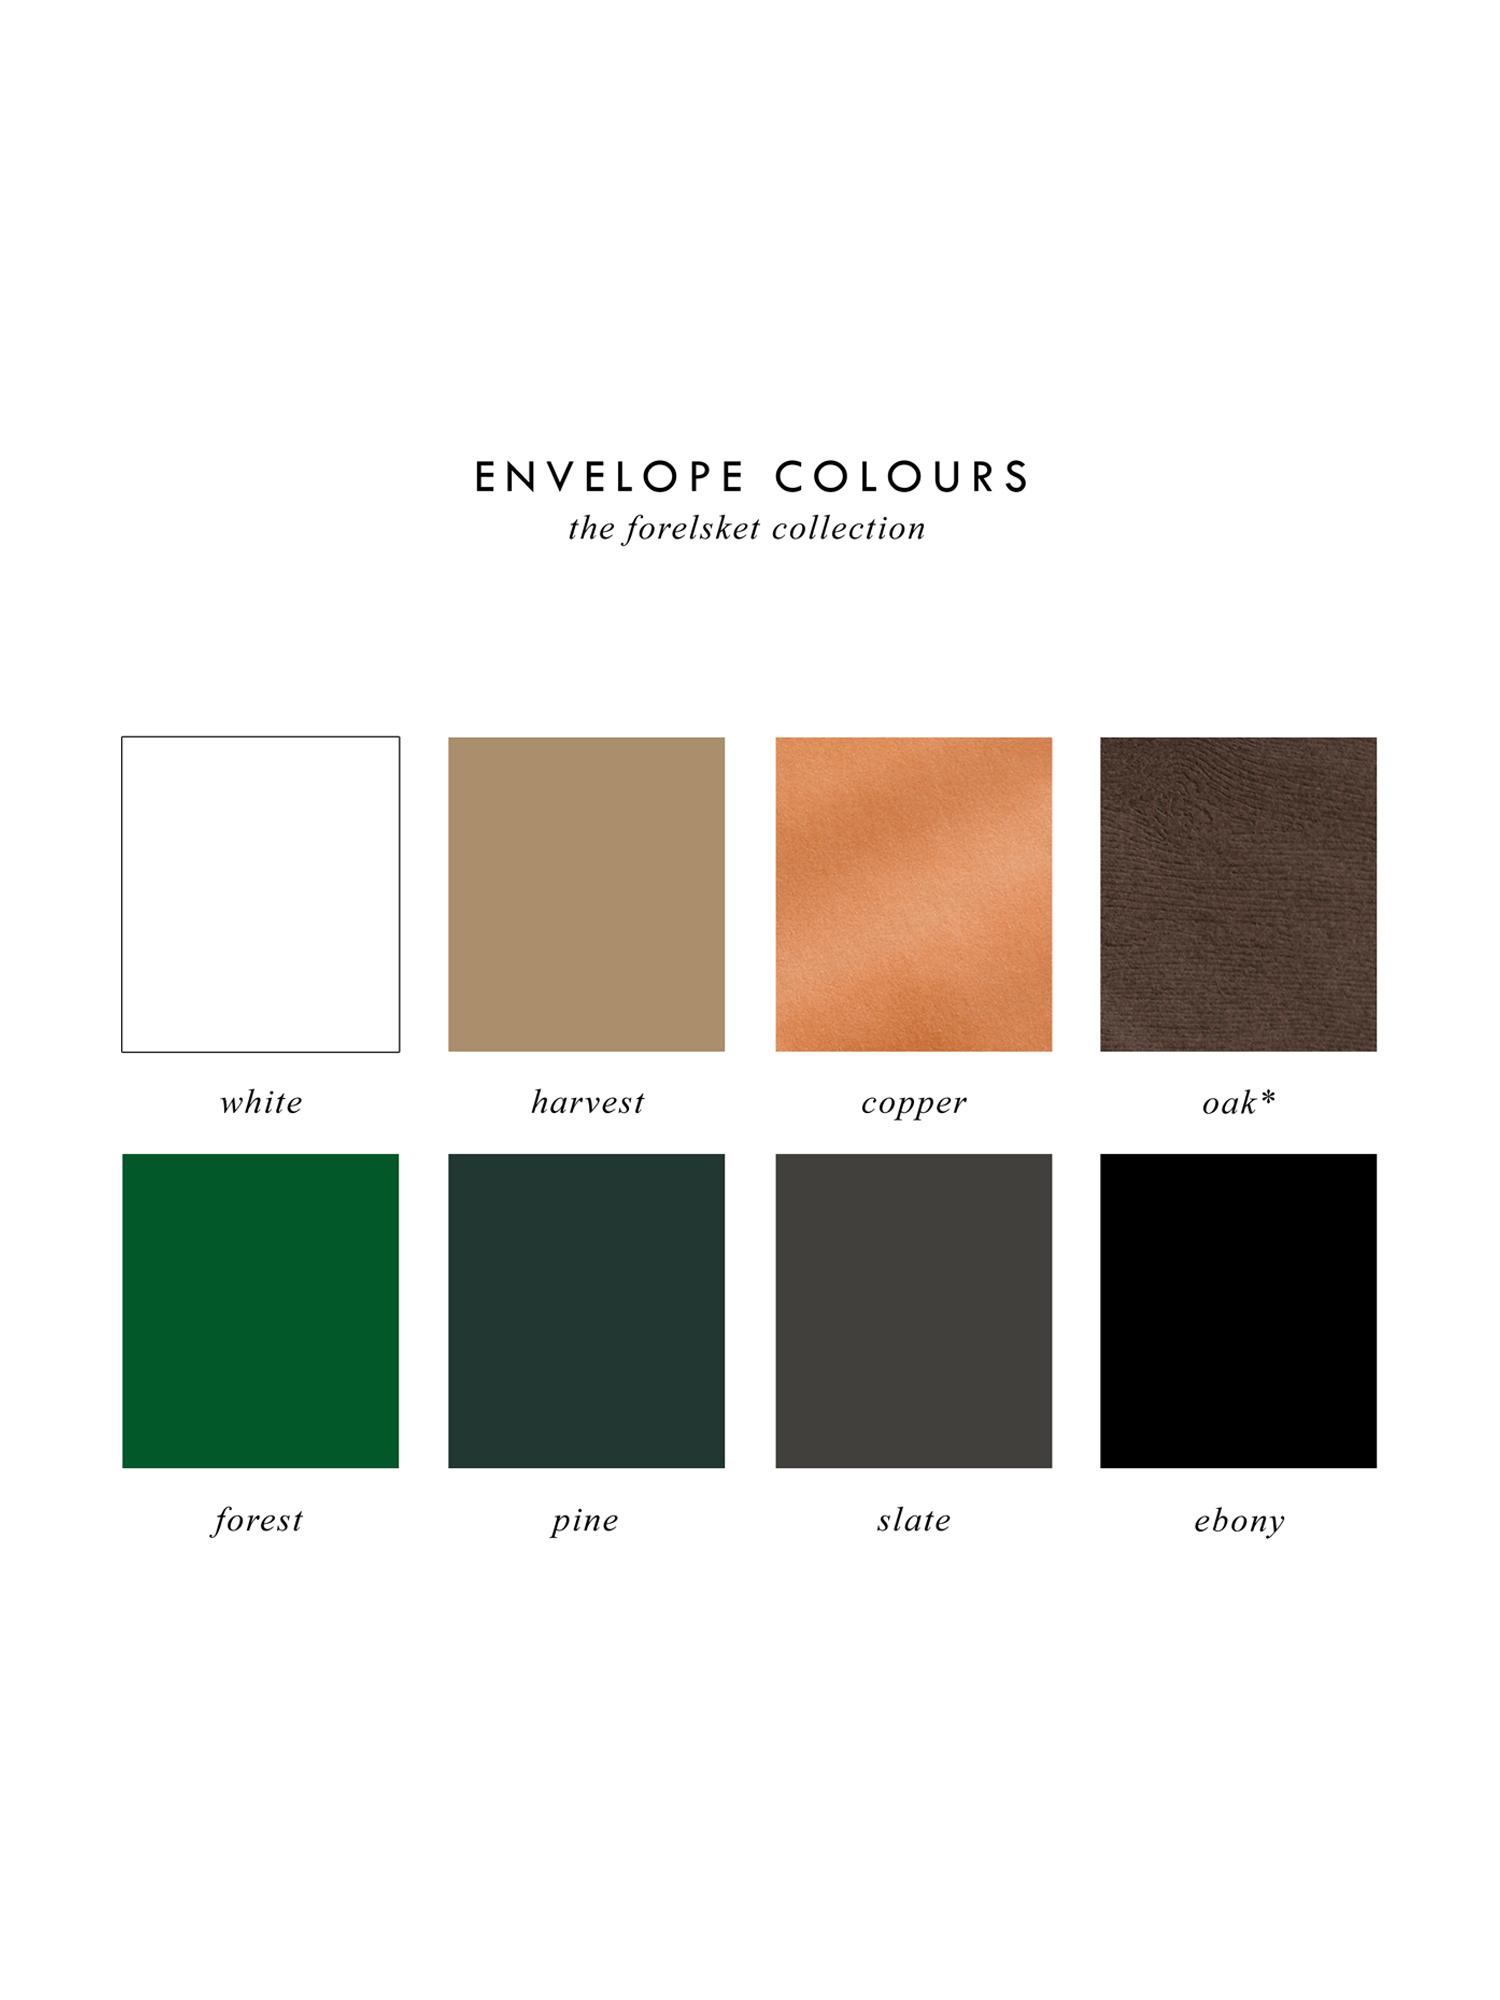 Forelsket Semi Custom Collection - Envelope Colours